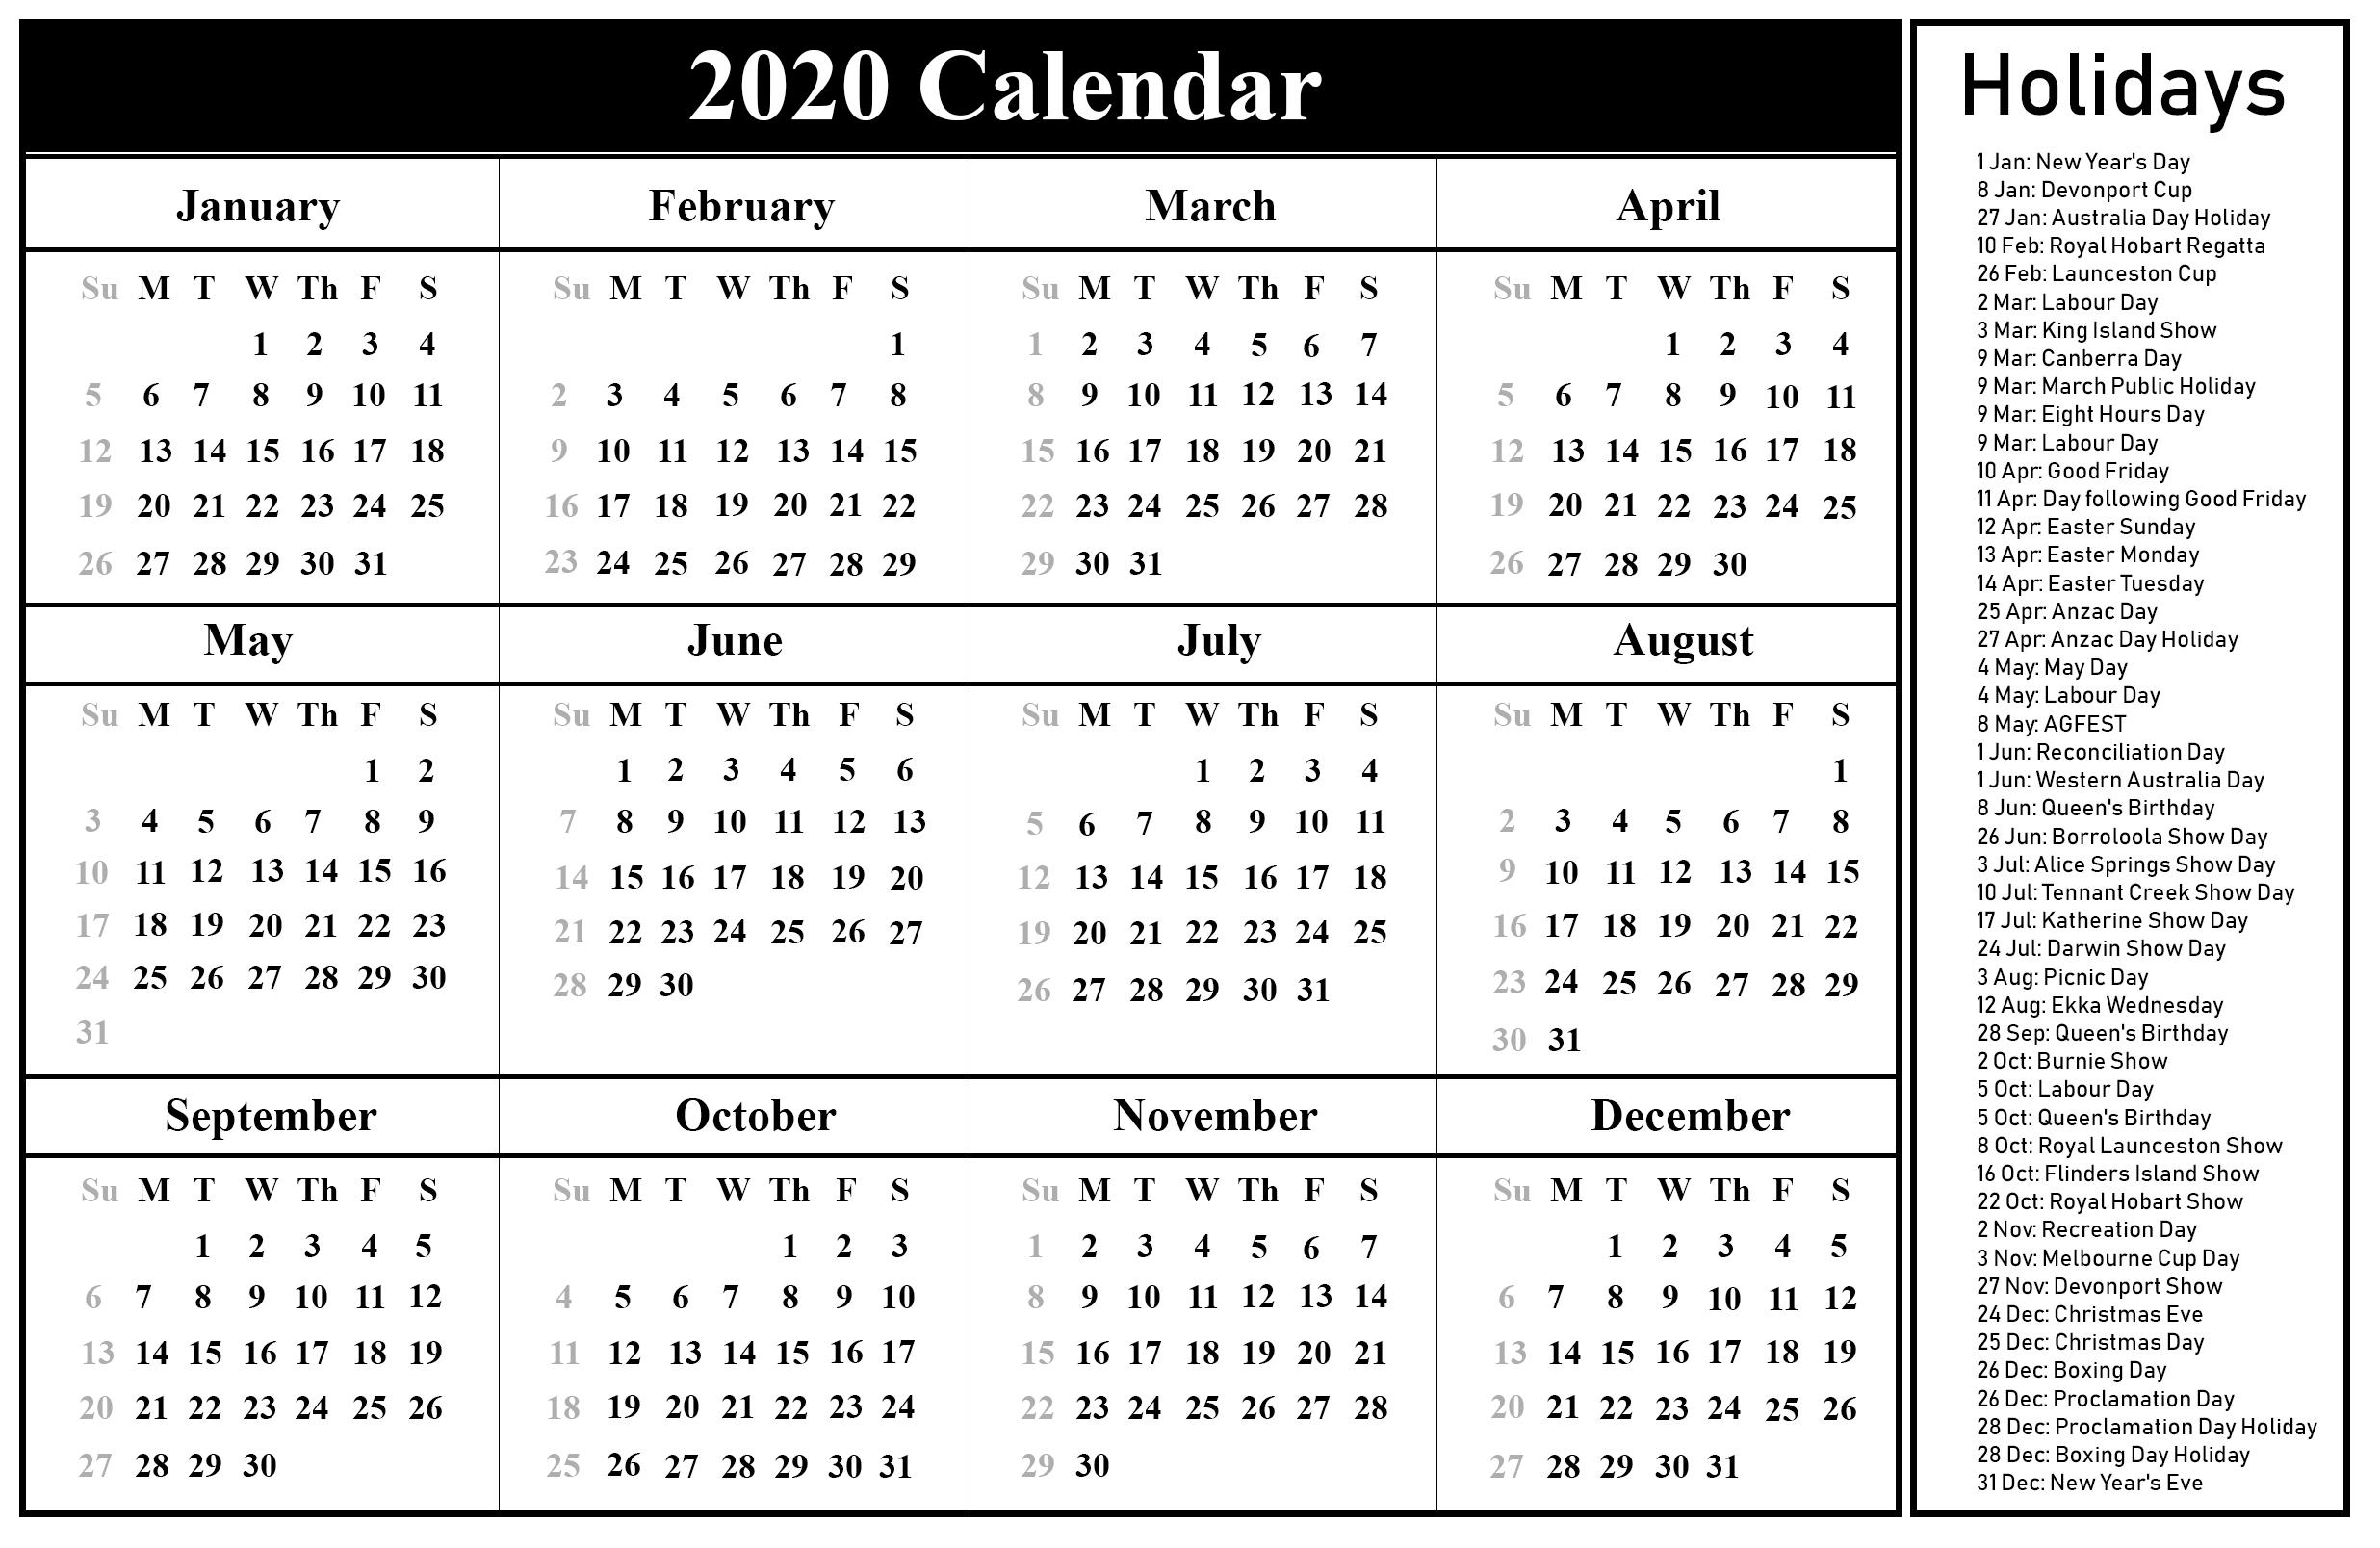 Free Blank Australia Calendar 2020 In Pdf, Excel & Word throughout Calendar 2020 Australia